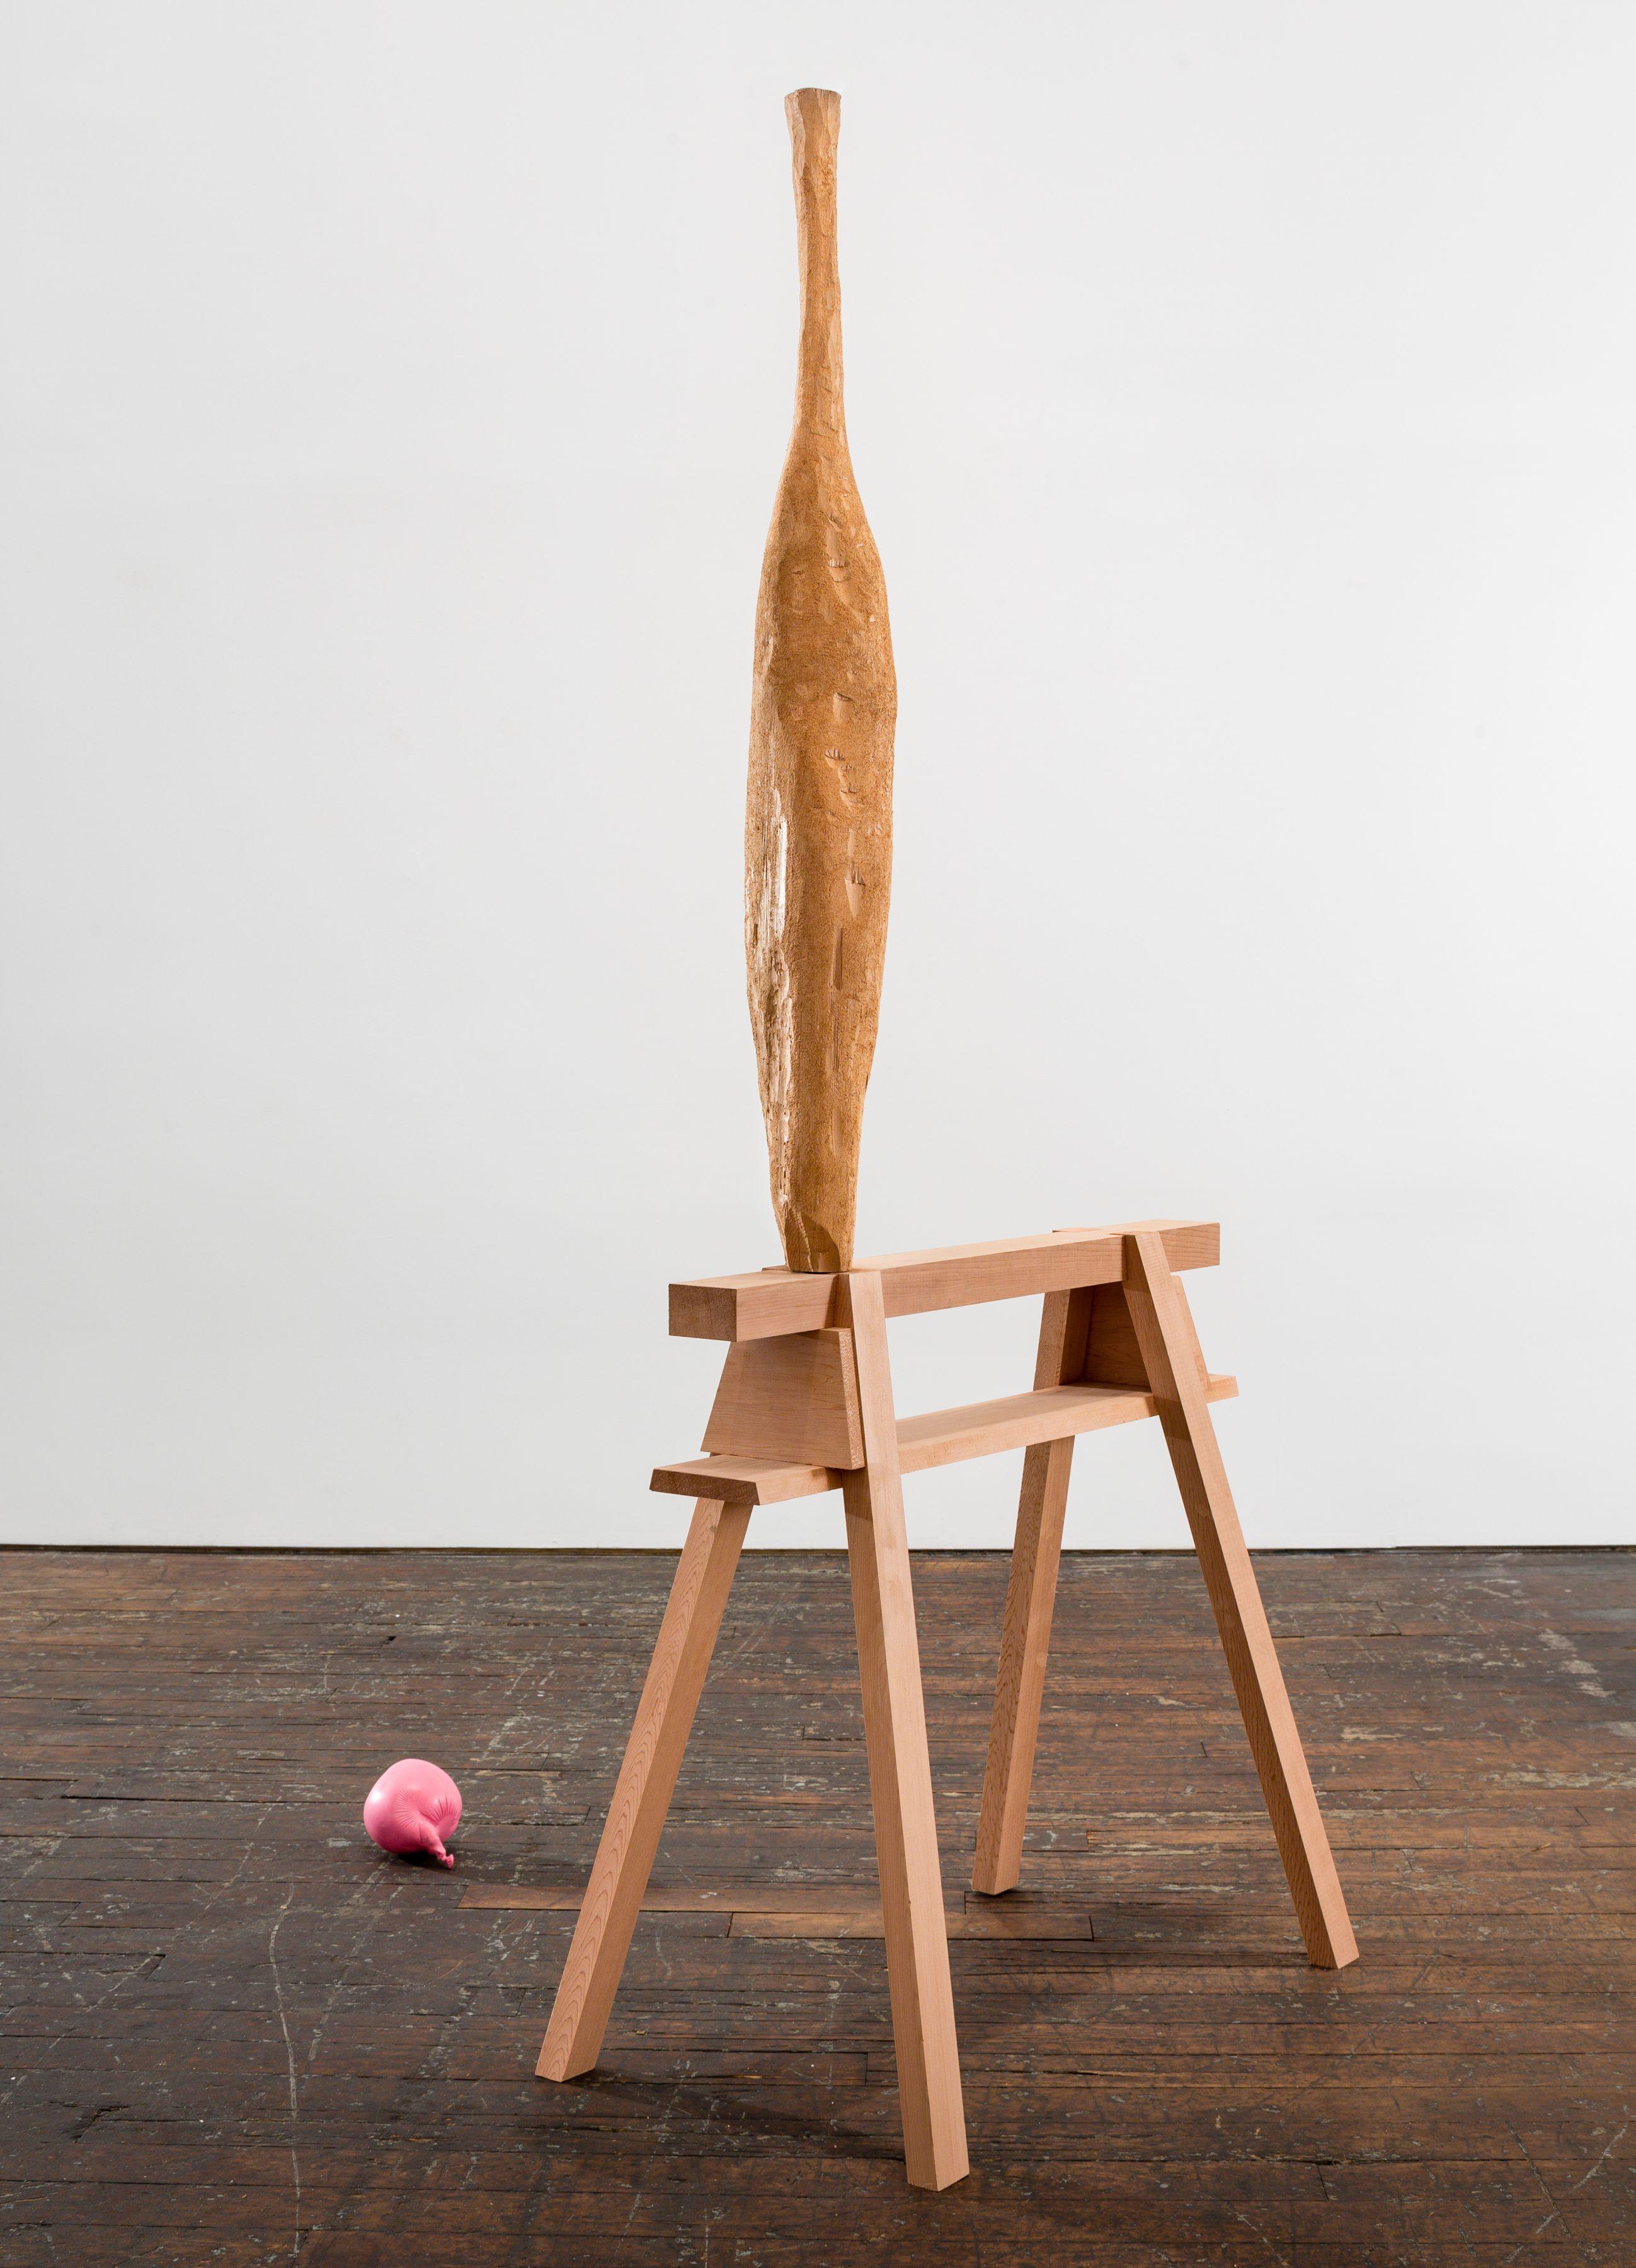 David Adamo Untitled (vessel and balloon)